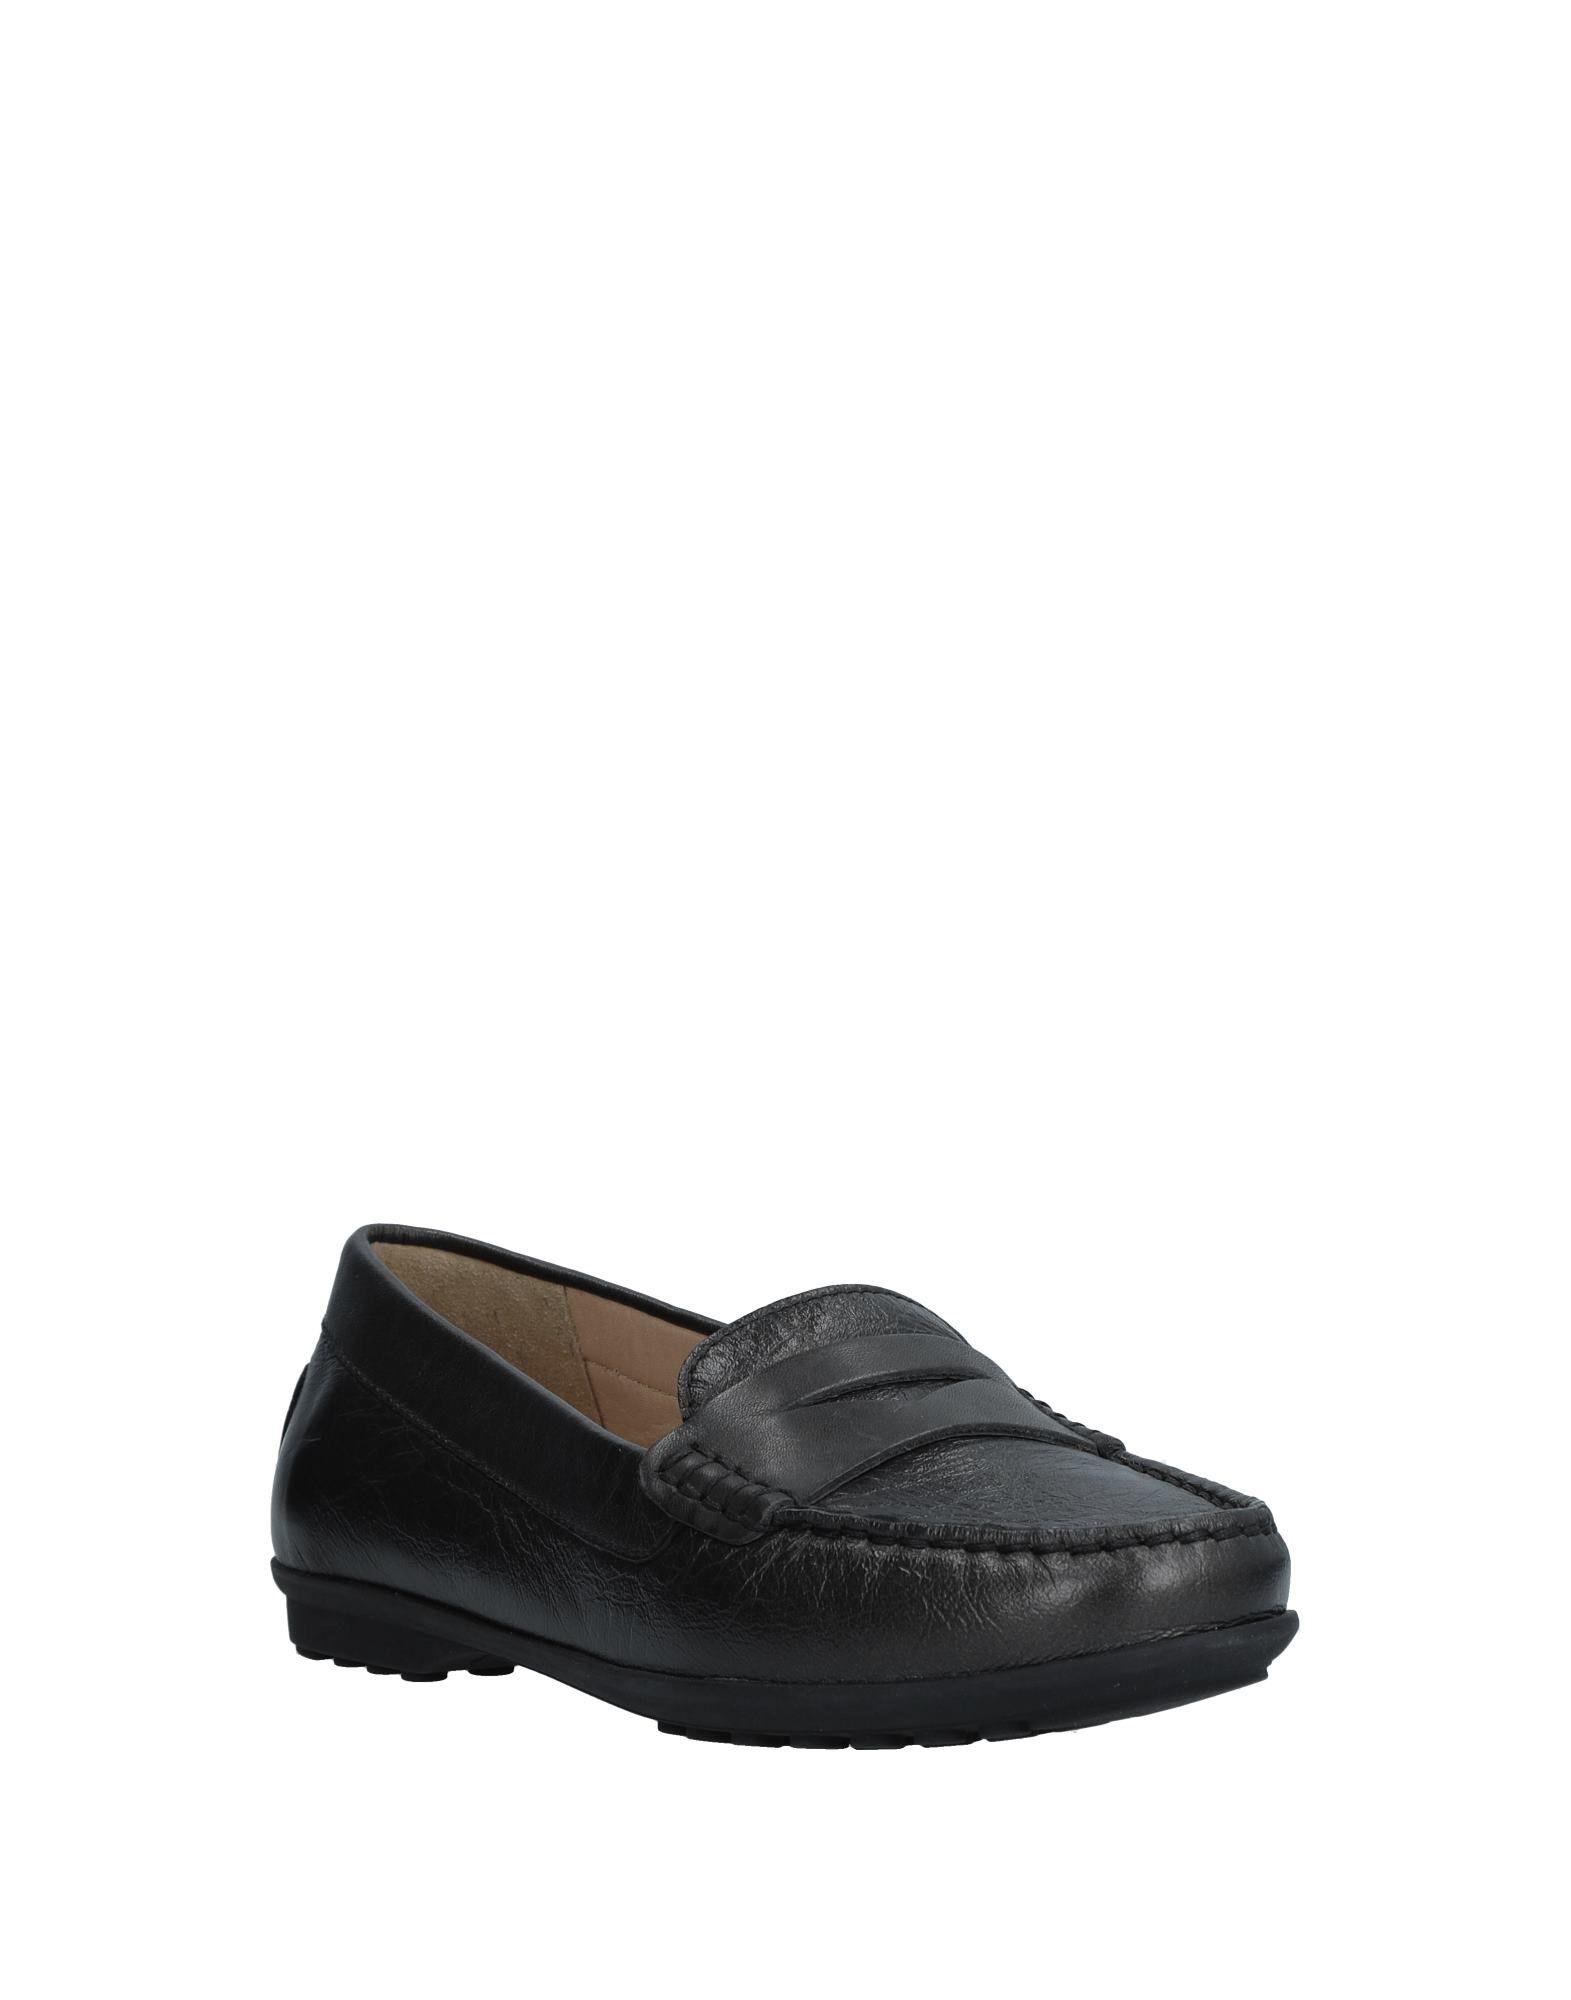 Geox Mokassins Damen   Damen 11540578PE Heiße Schuhe 782c4e